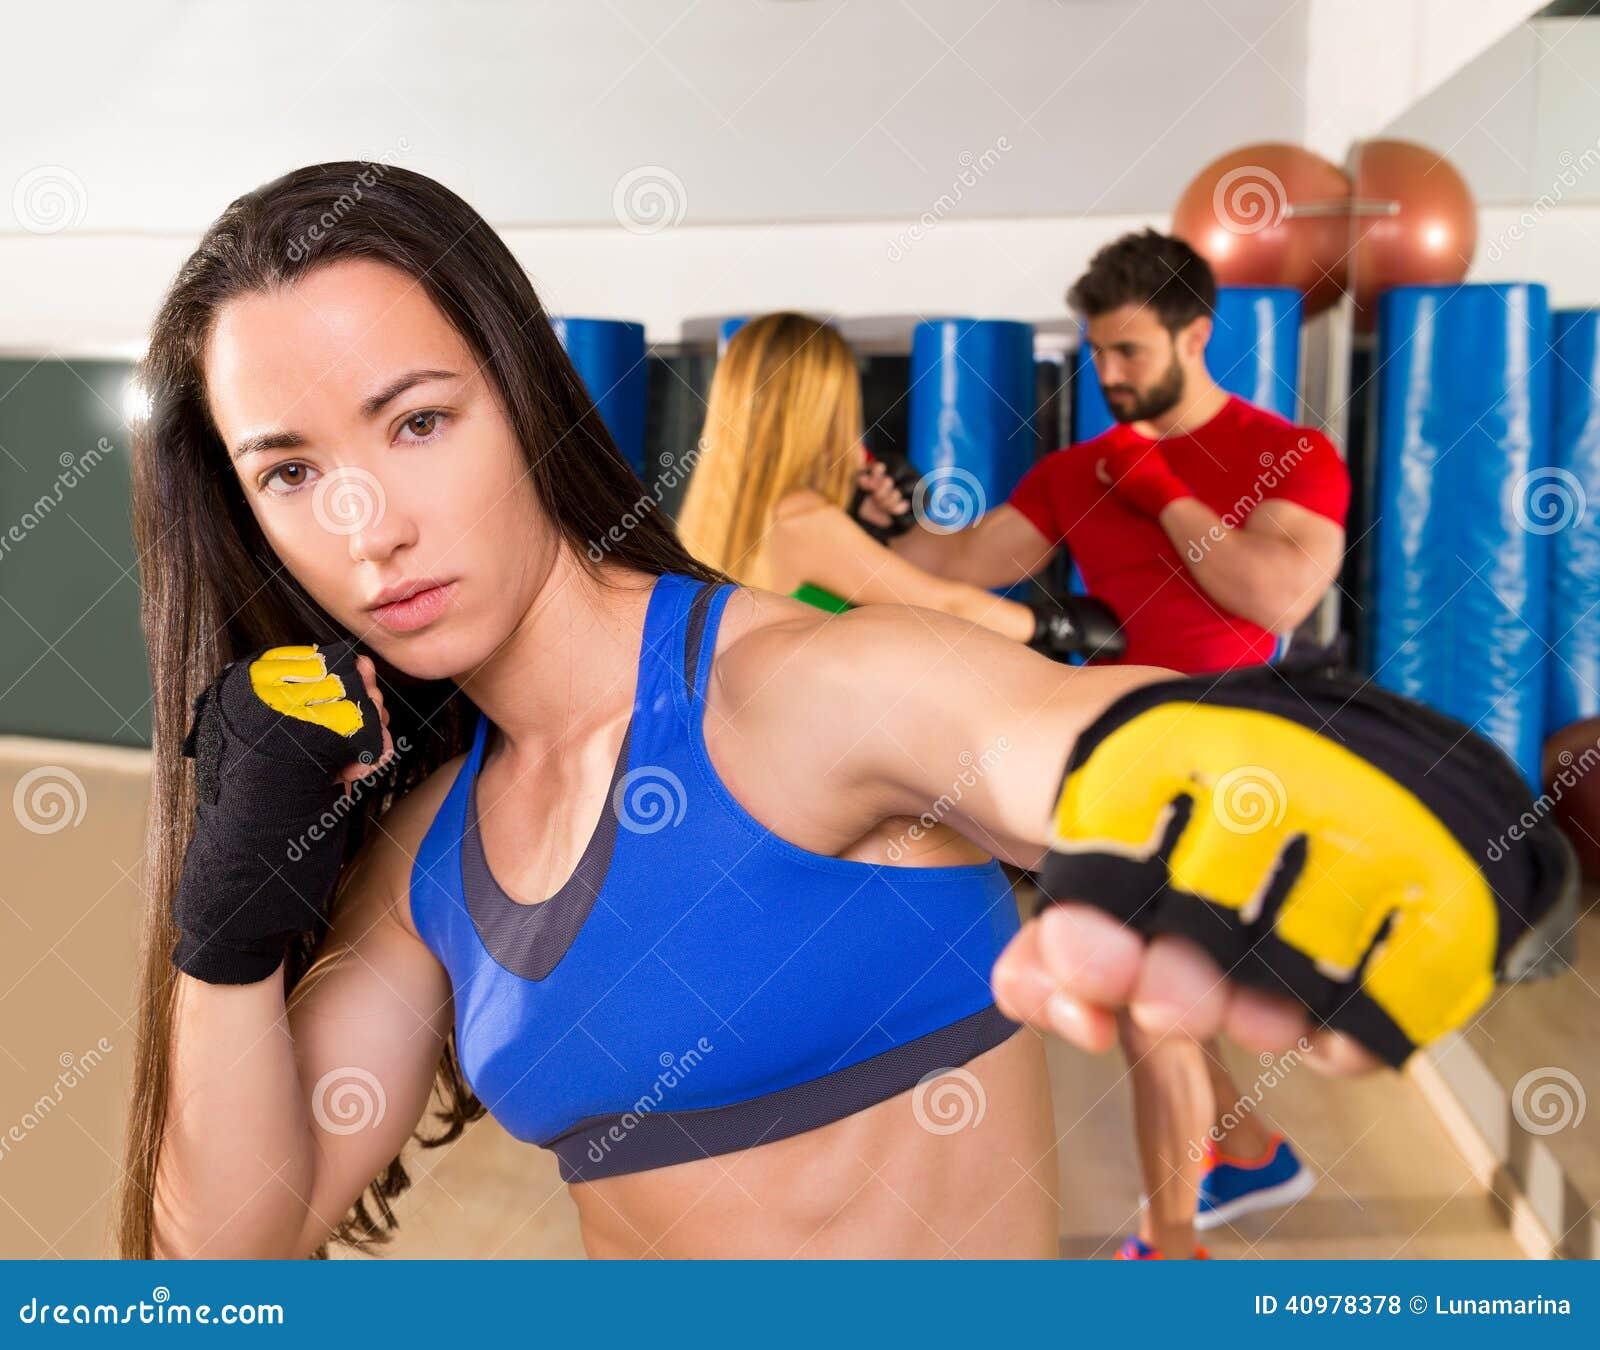 Boxing aerobox woman portrait in fitness gym